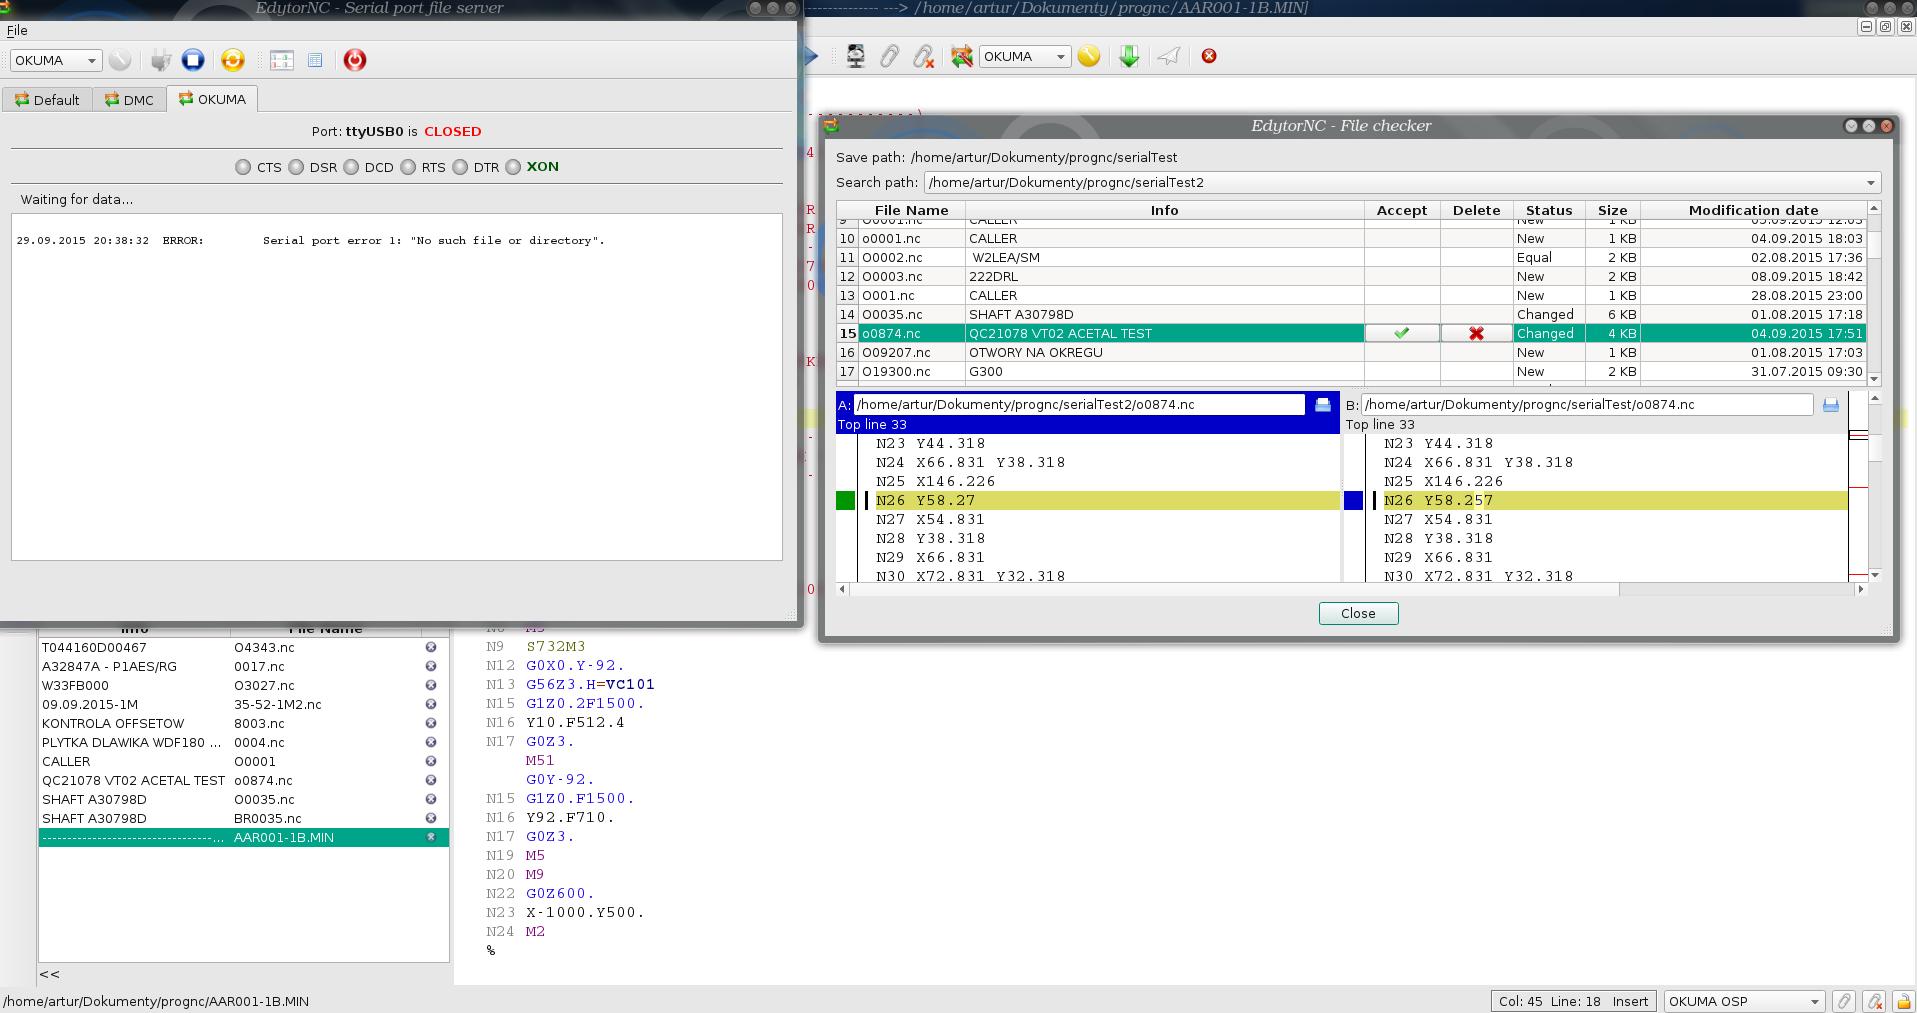 Free V24 Dnc Software - vegalopartpf